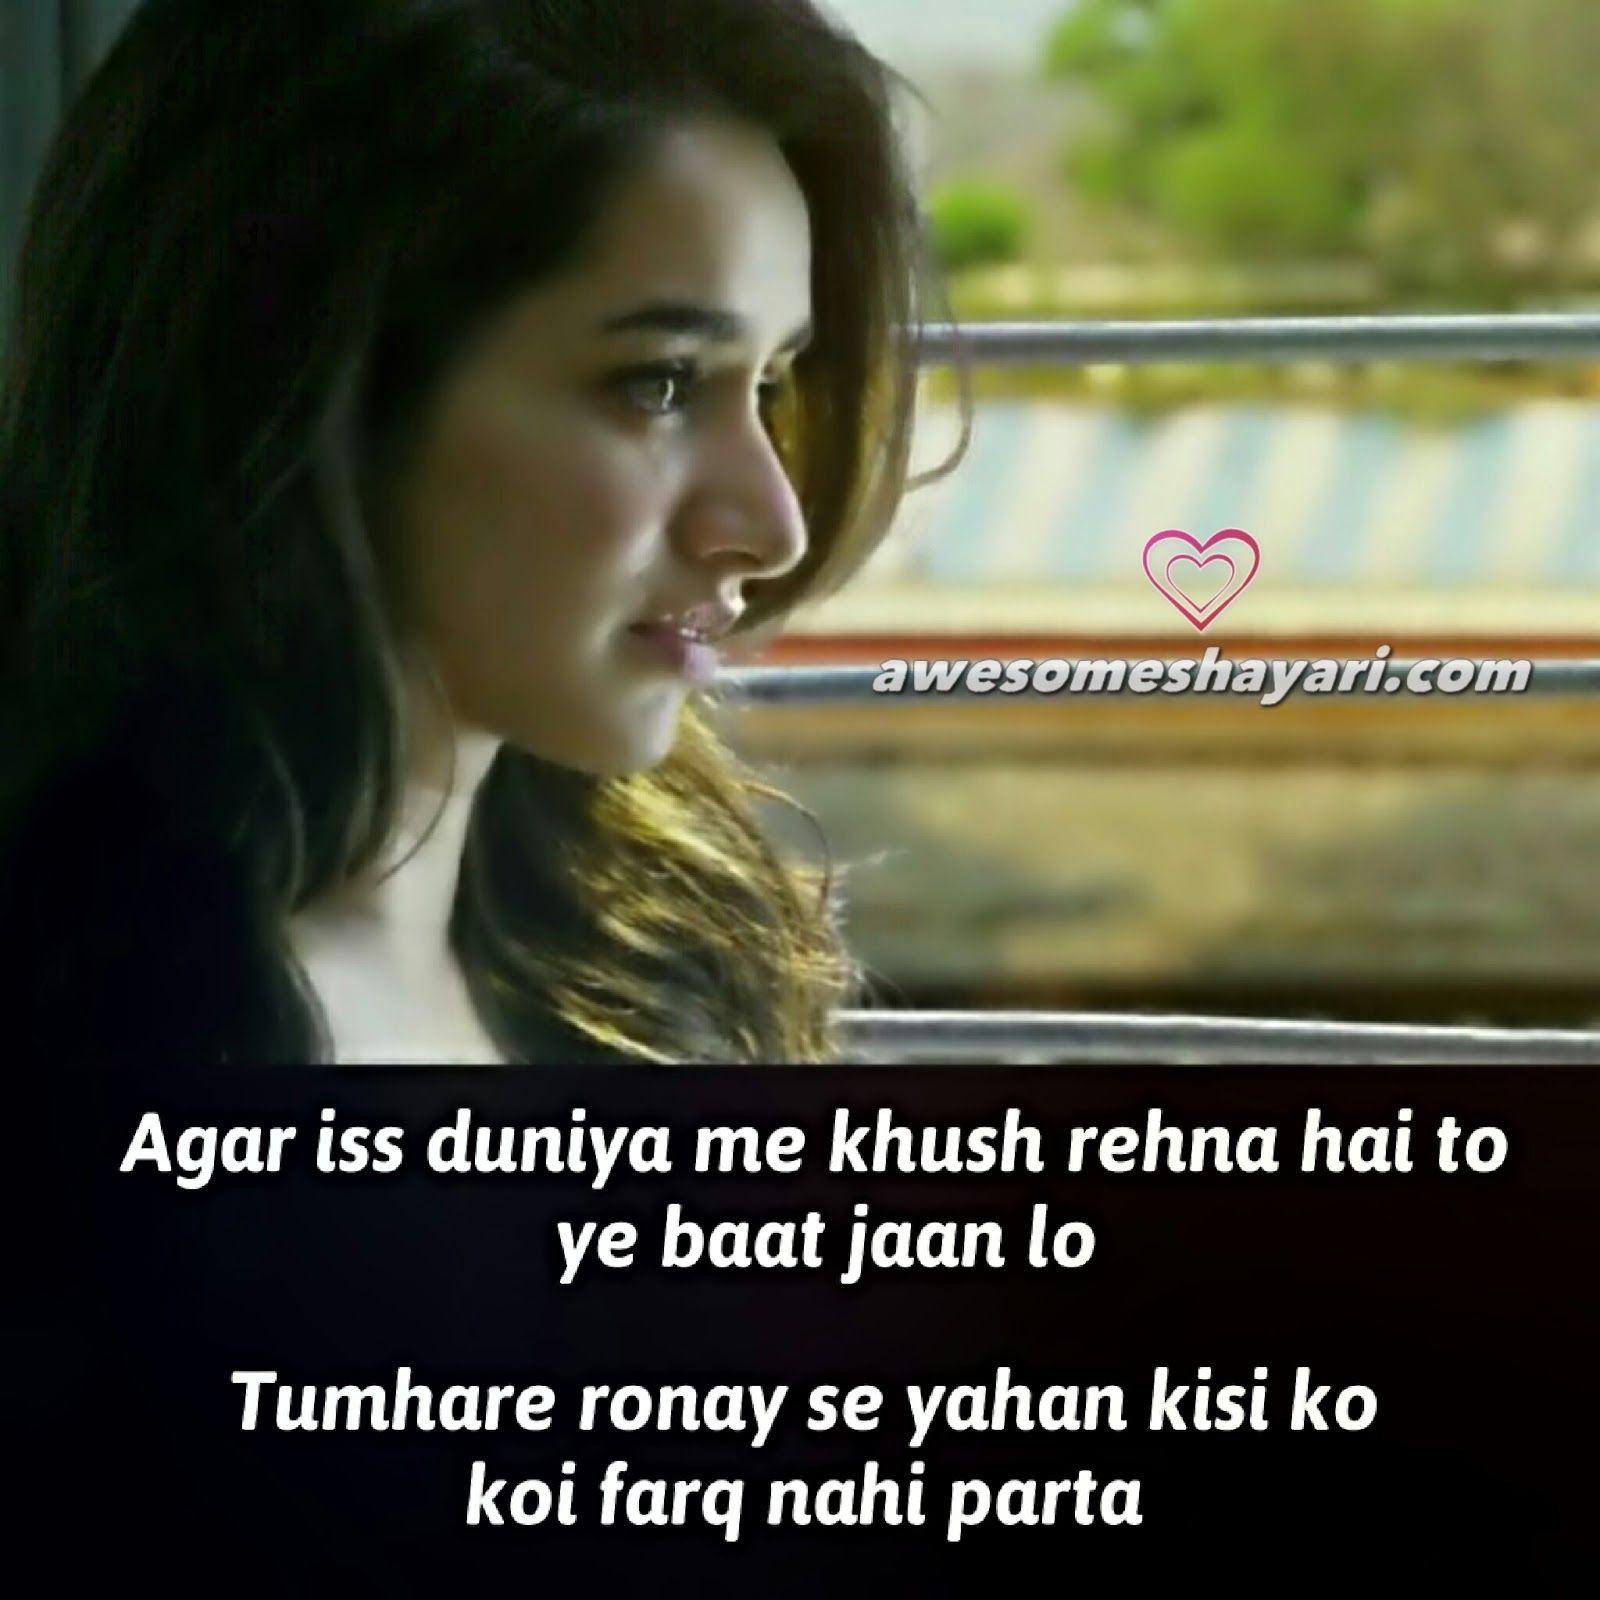 Sad Boy Alone Quotes: Awesome Shayari Images, Love Shayari, Heart Touching